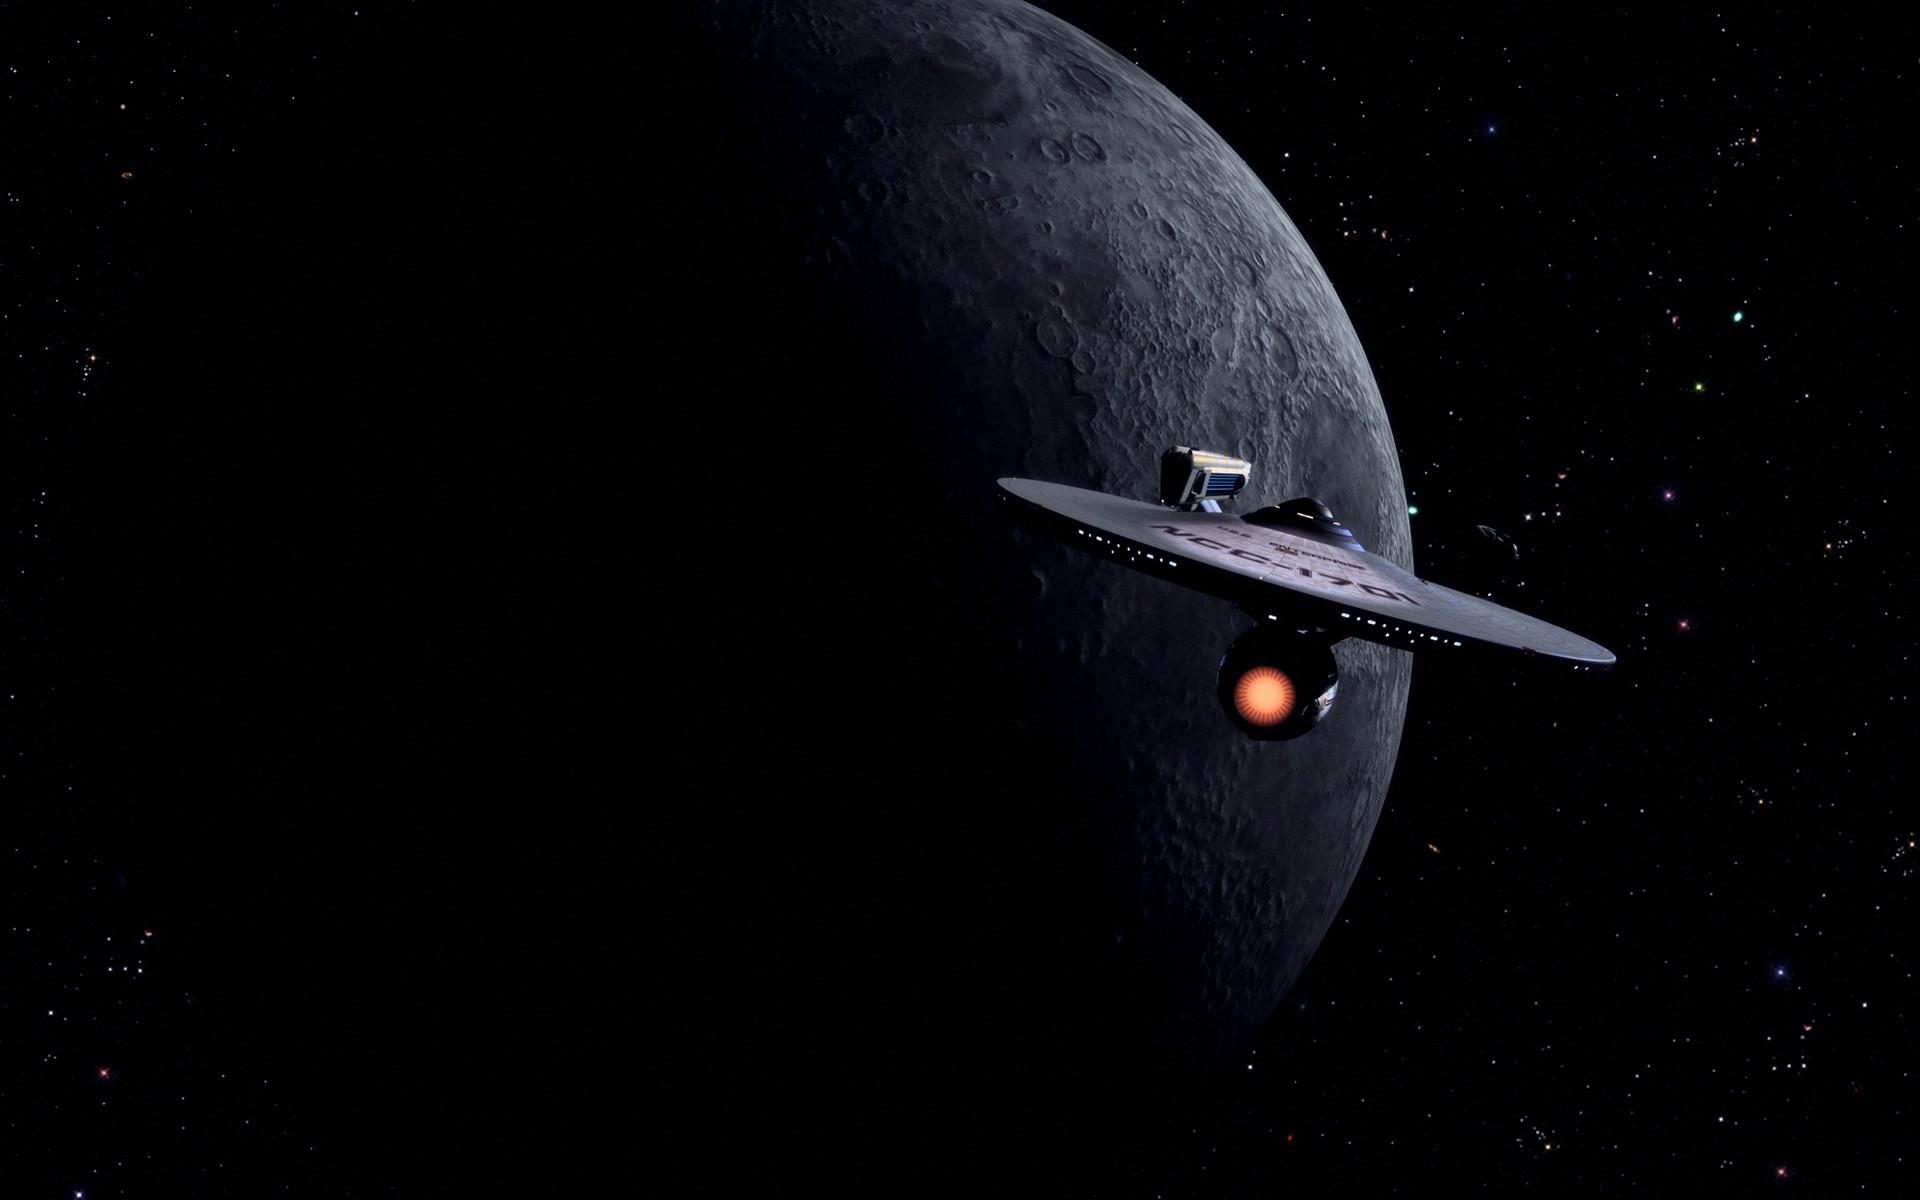 Star Trek Starship Enterprise Spaceship Moon Stars wallpaper      197310   WallpaperUP